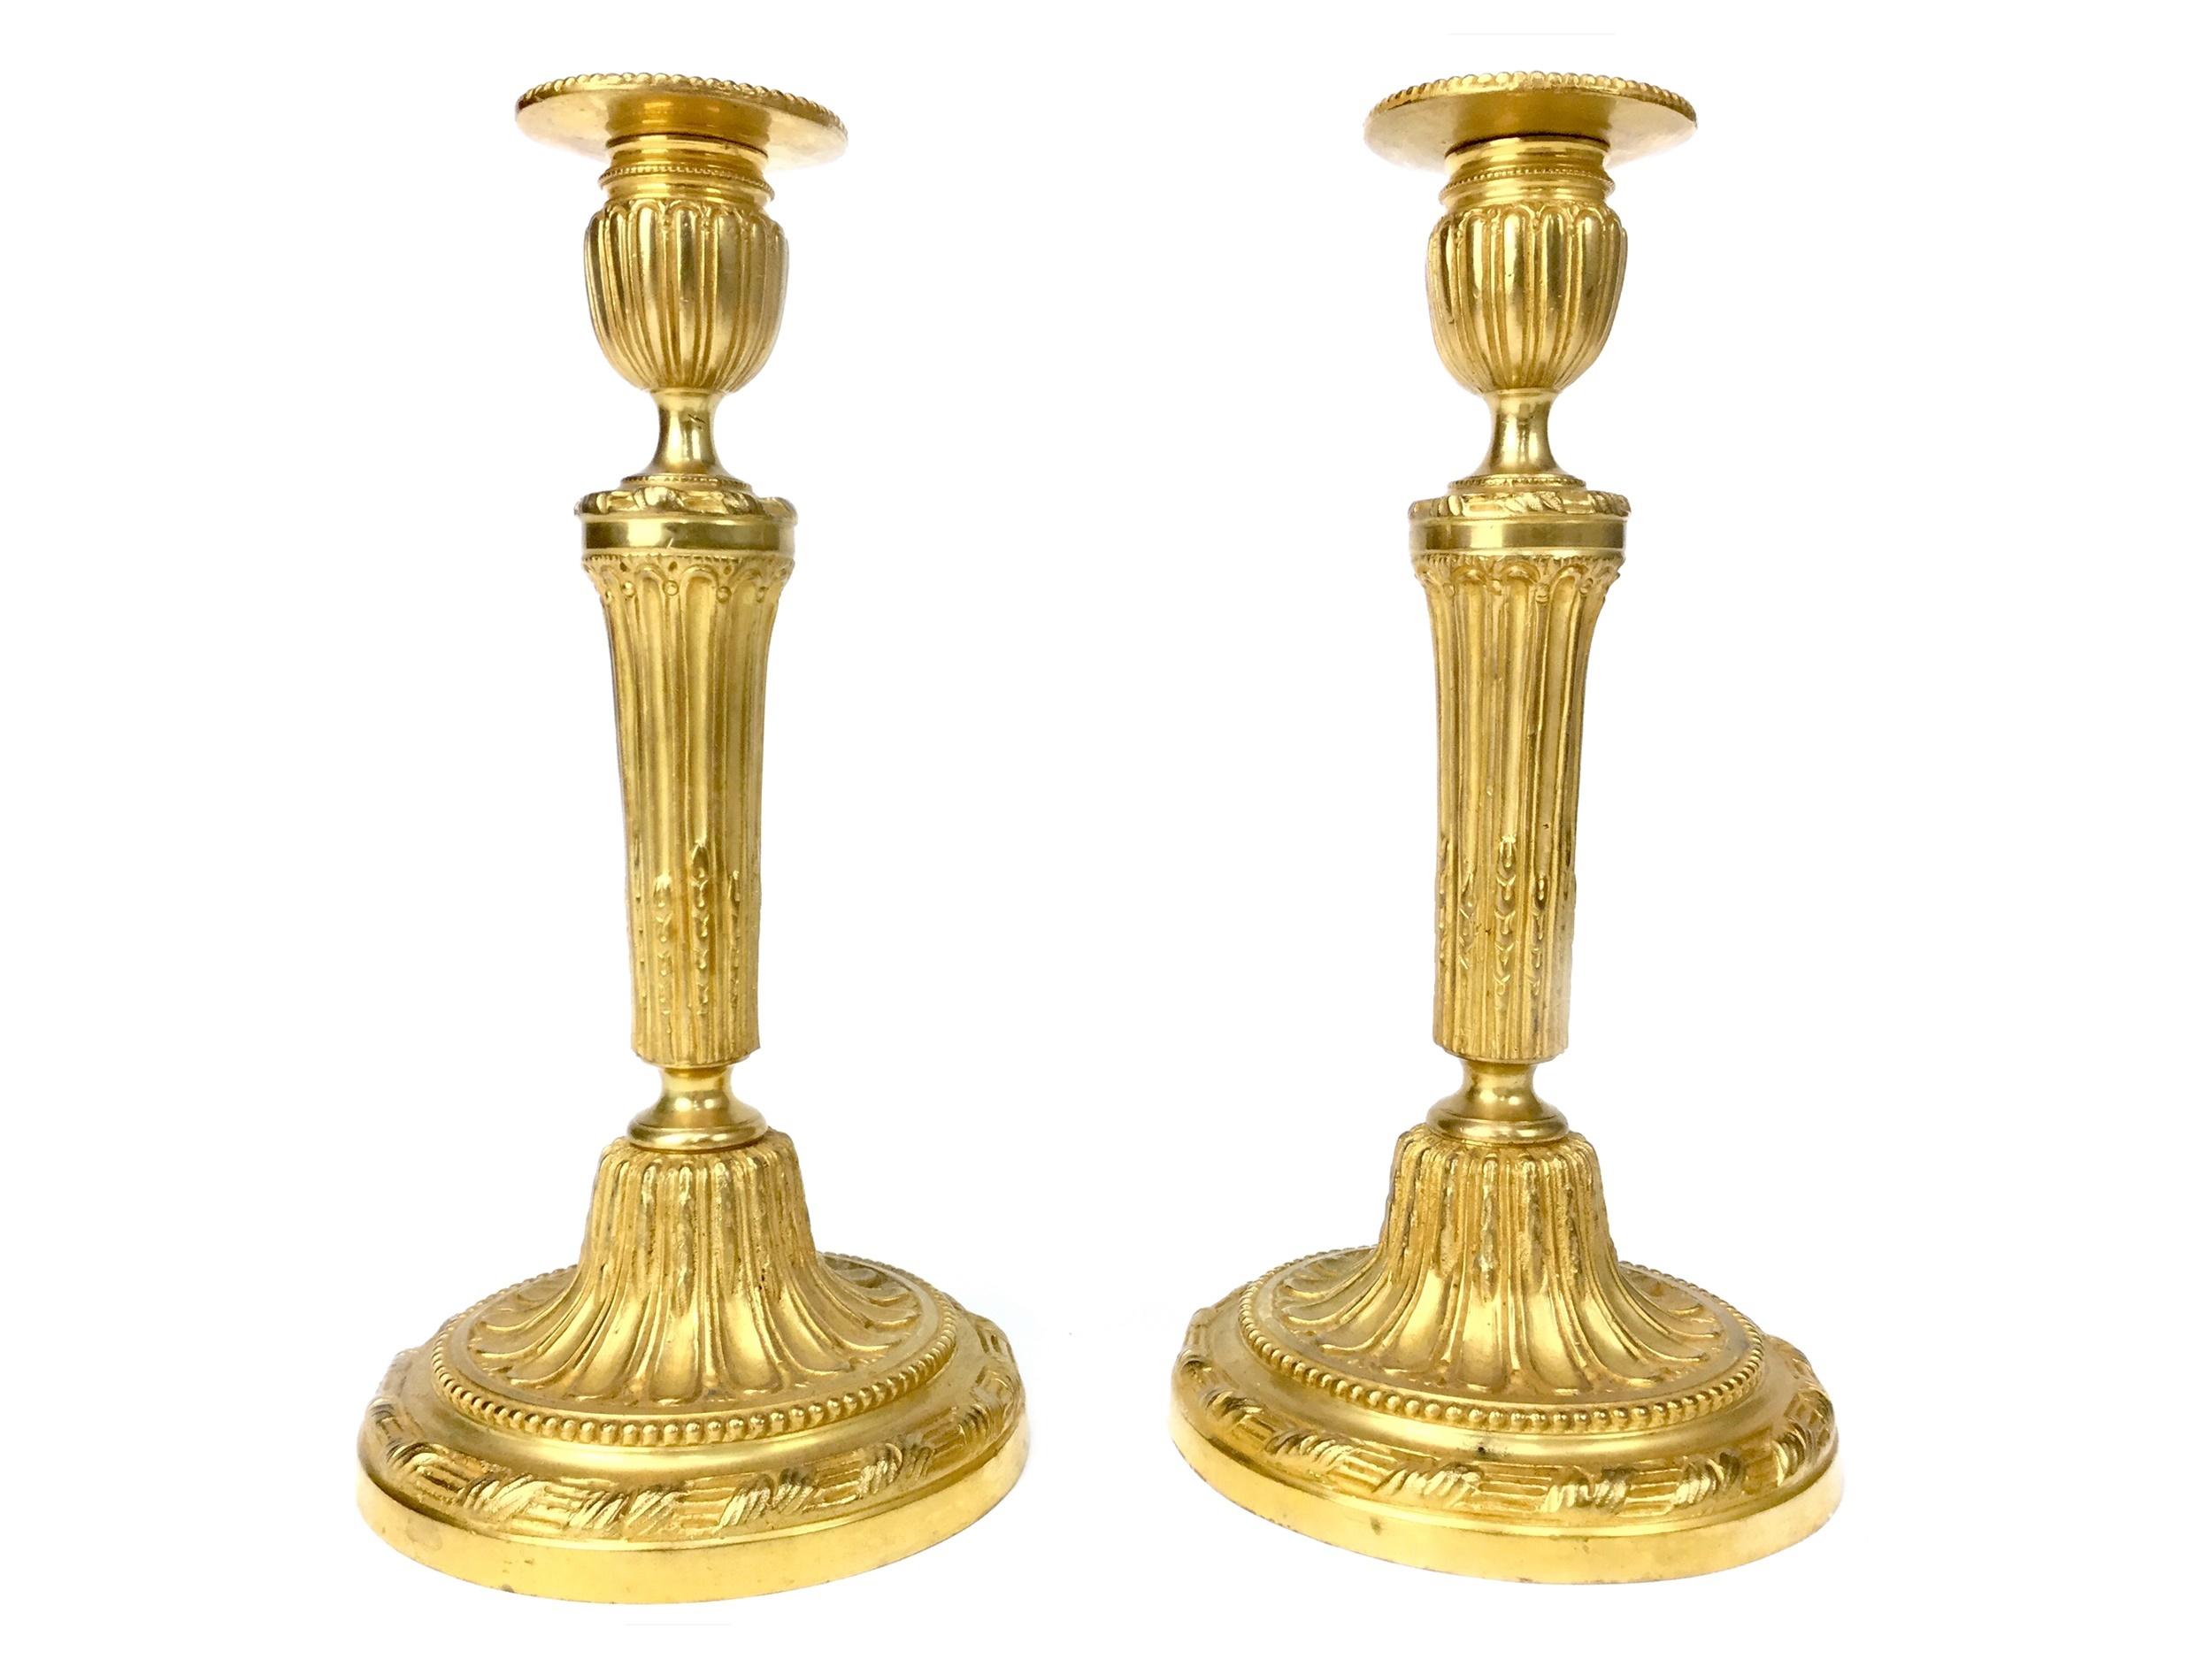 Lot 1629 - A PAIR OF VICTORIAN ORMOLU TABLE CANDLESTICKS